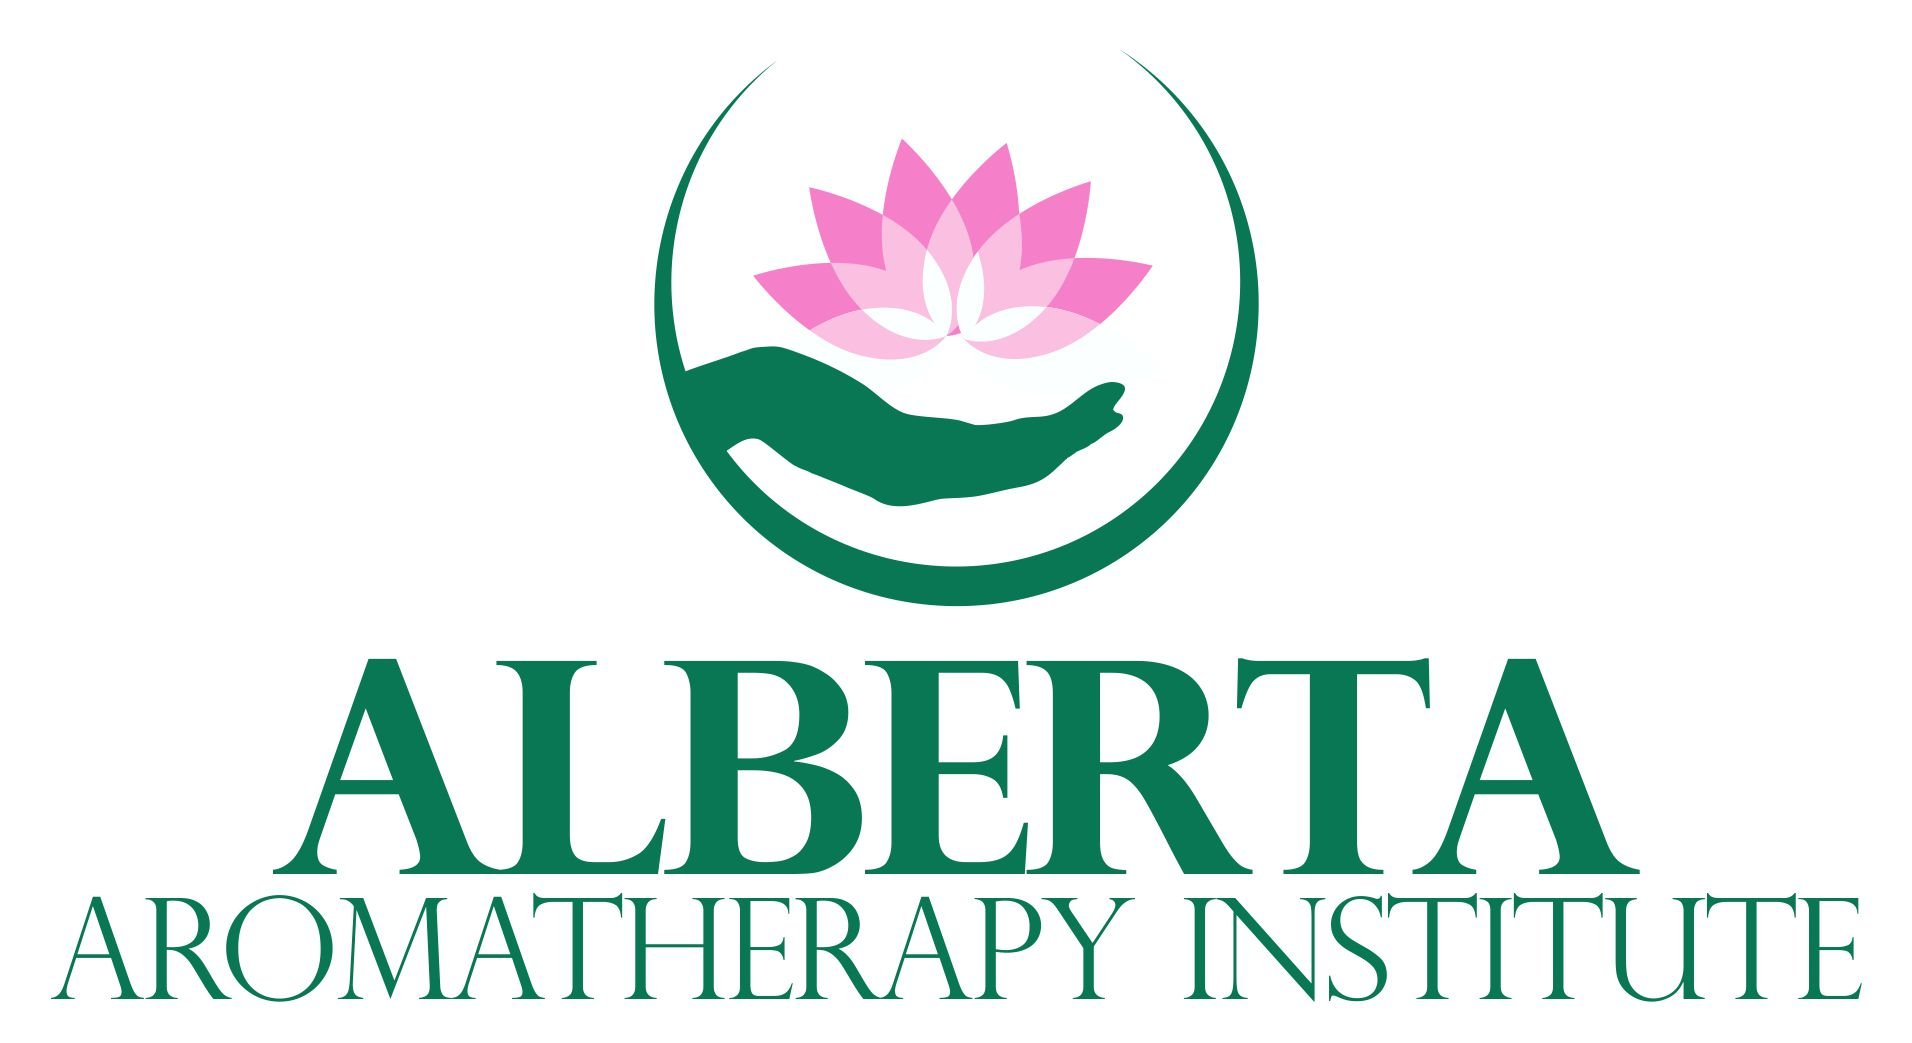 Alberta Aromatherapy Institute